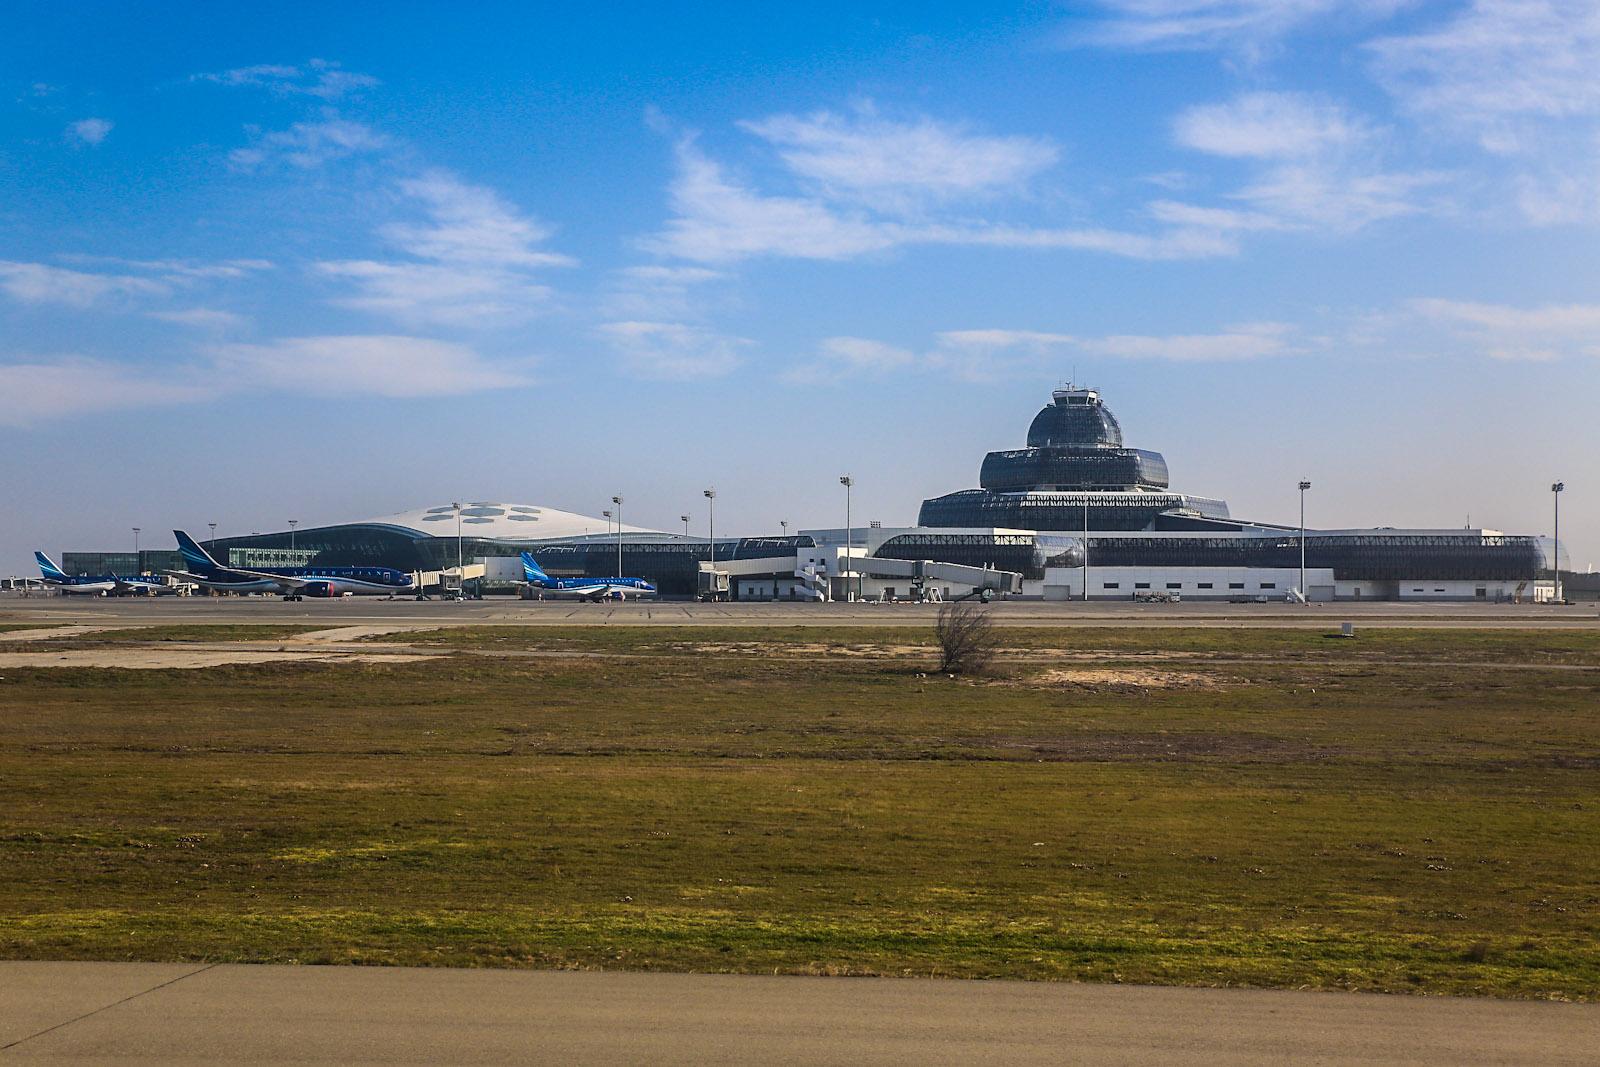 Пассажирские терминалы аэропорта Баку имени Гейдара Алиева